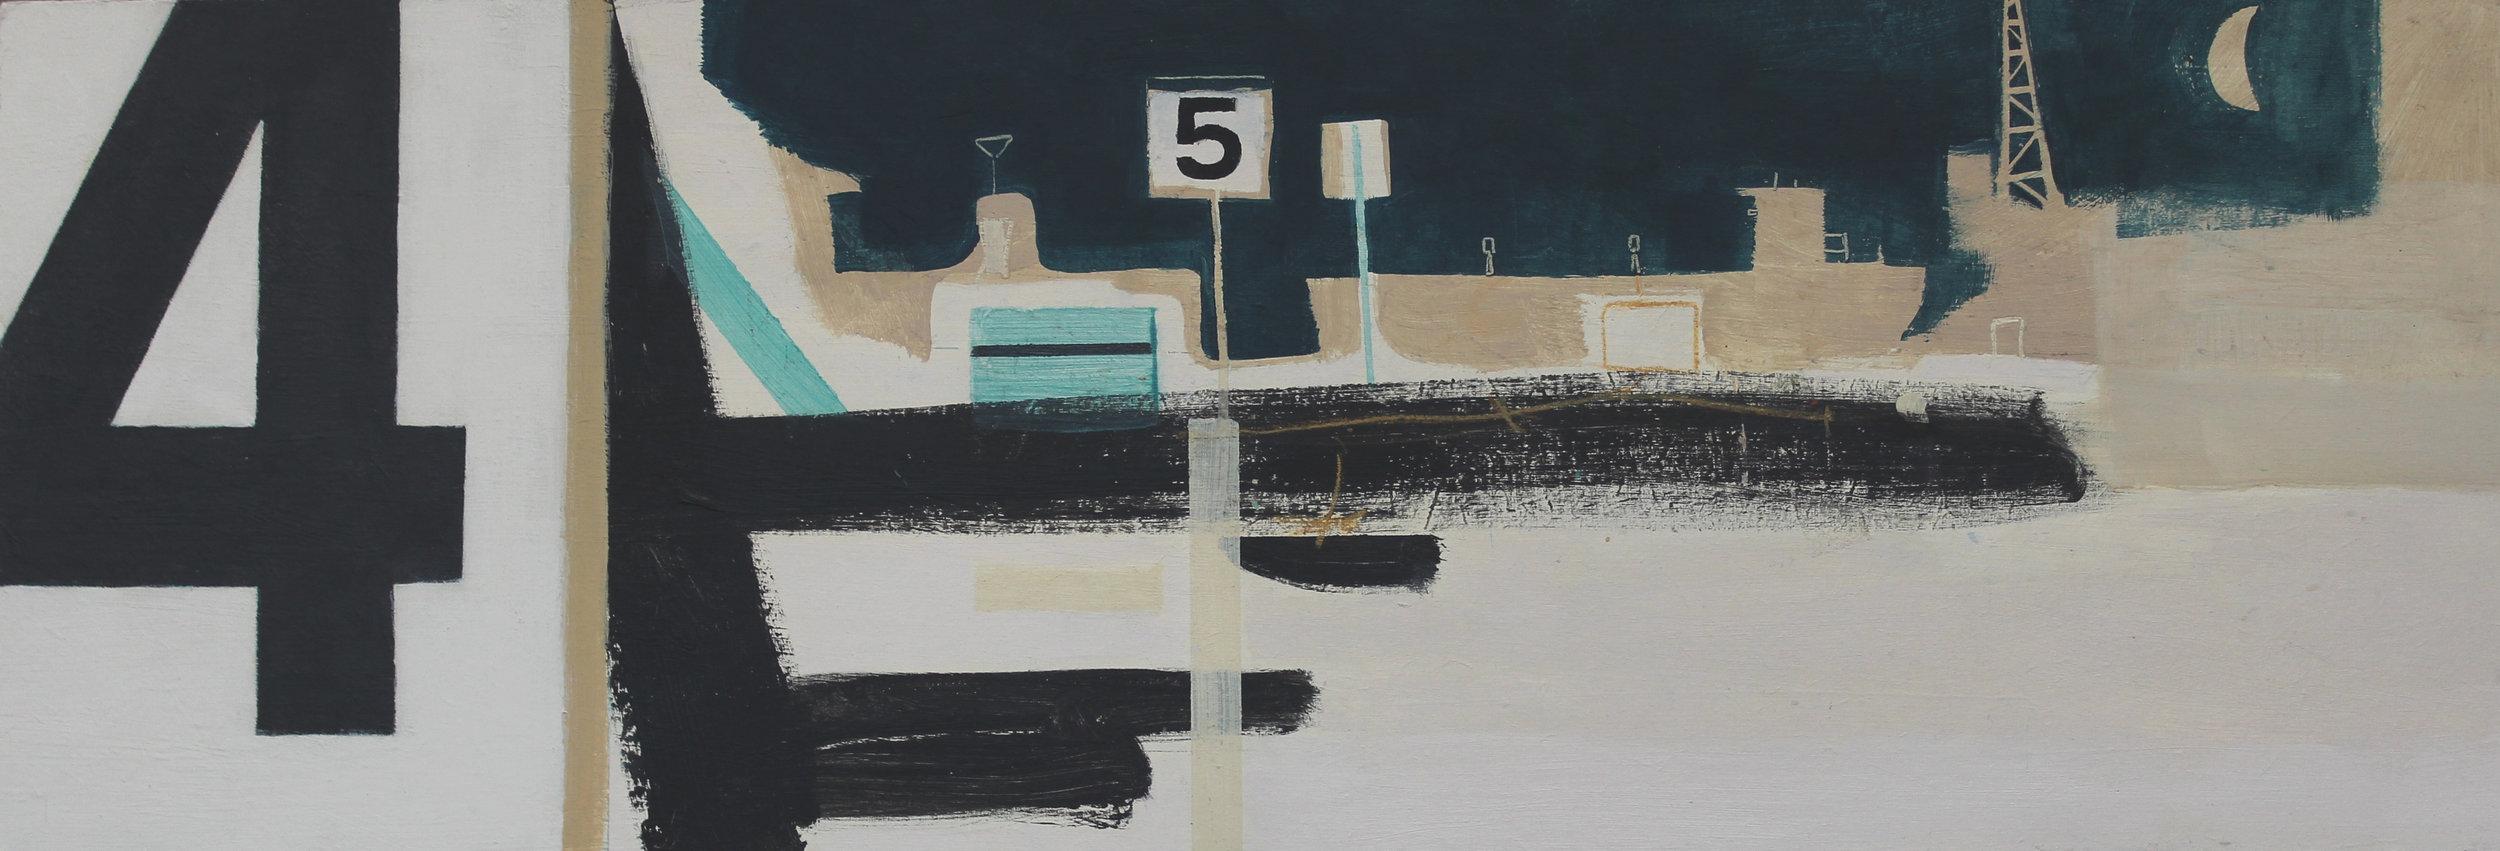 Moonlit shipyard, Falmouth.